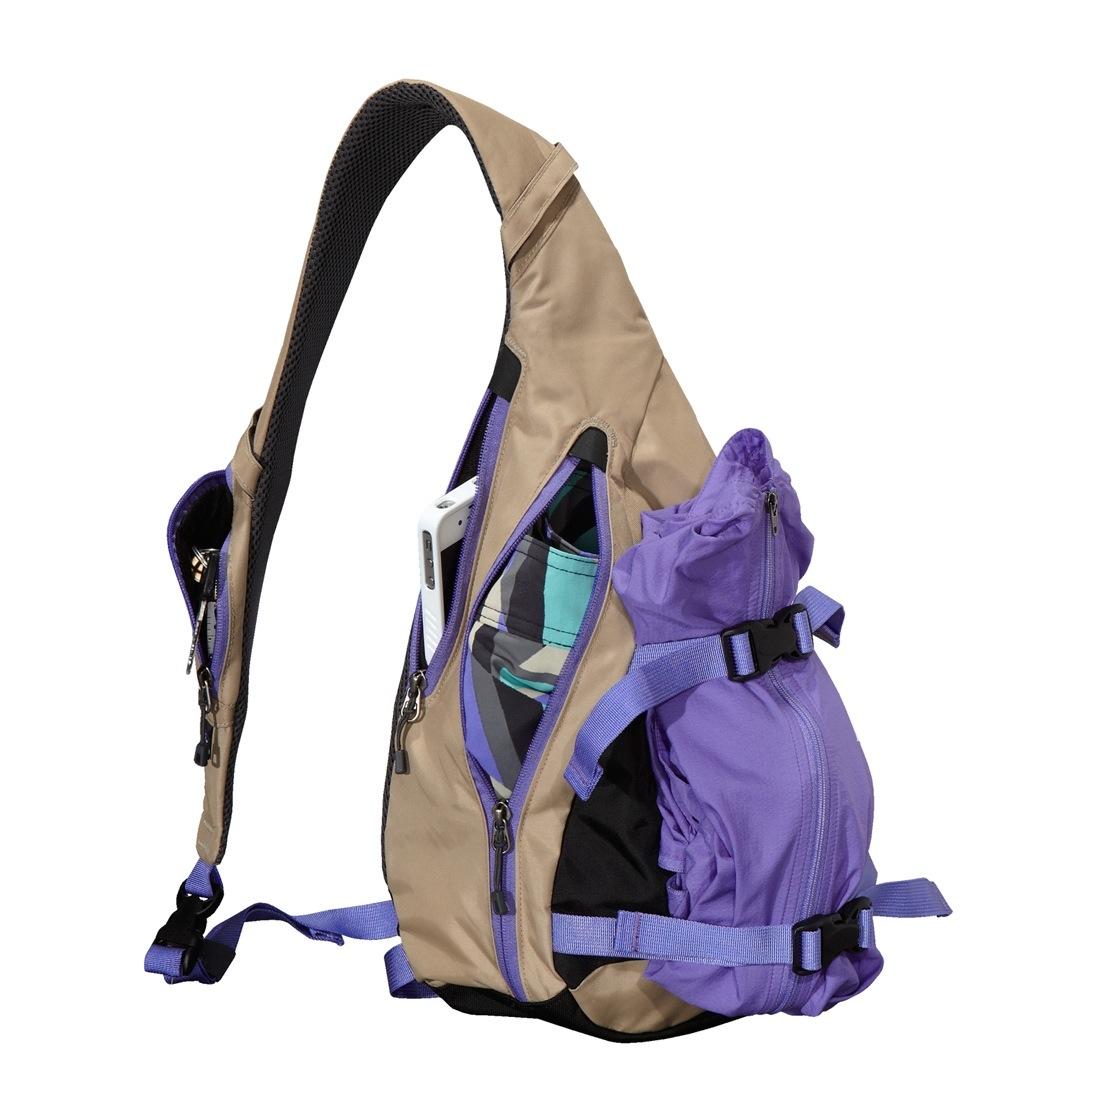 Patagonia Atom Sling Bag Review - Messenger Bags